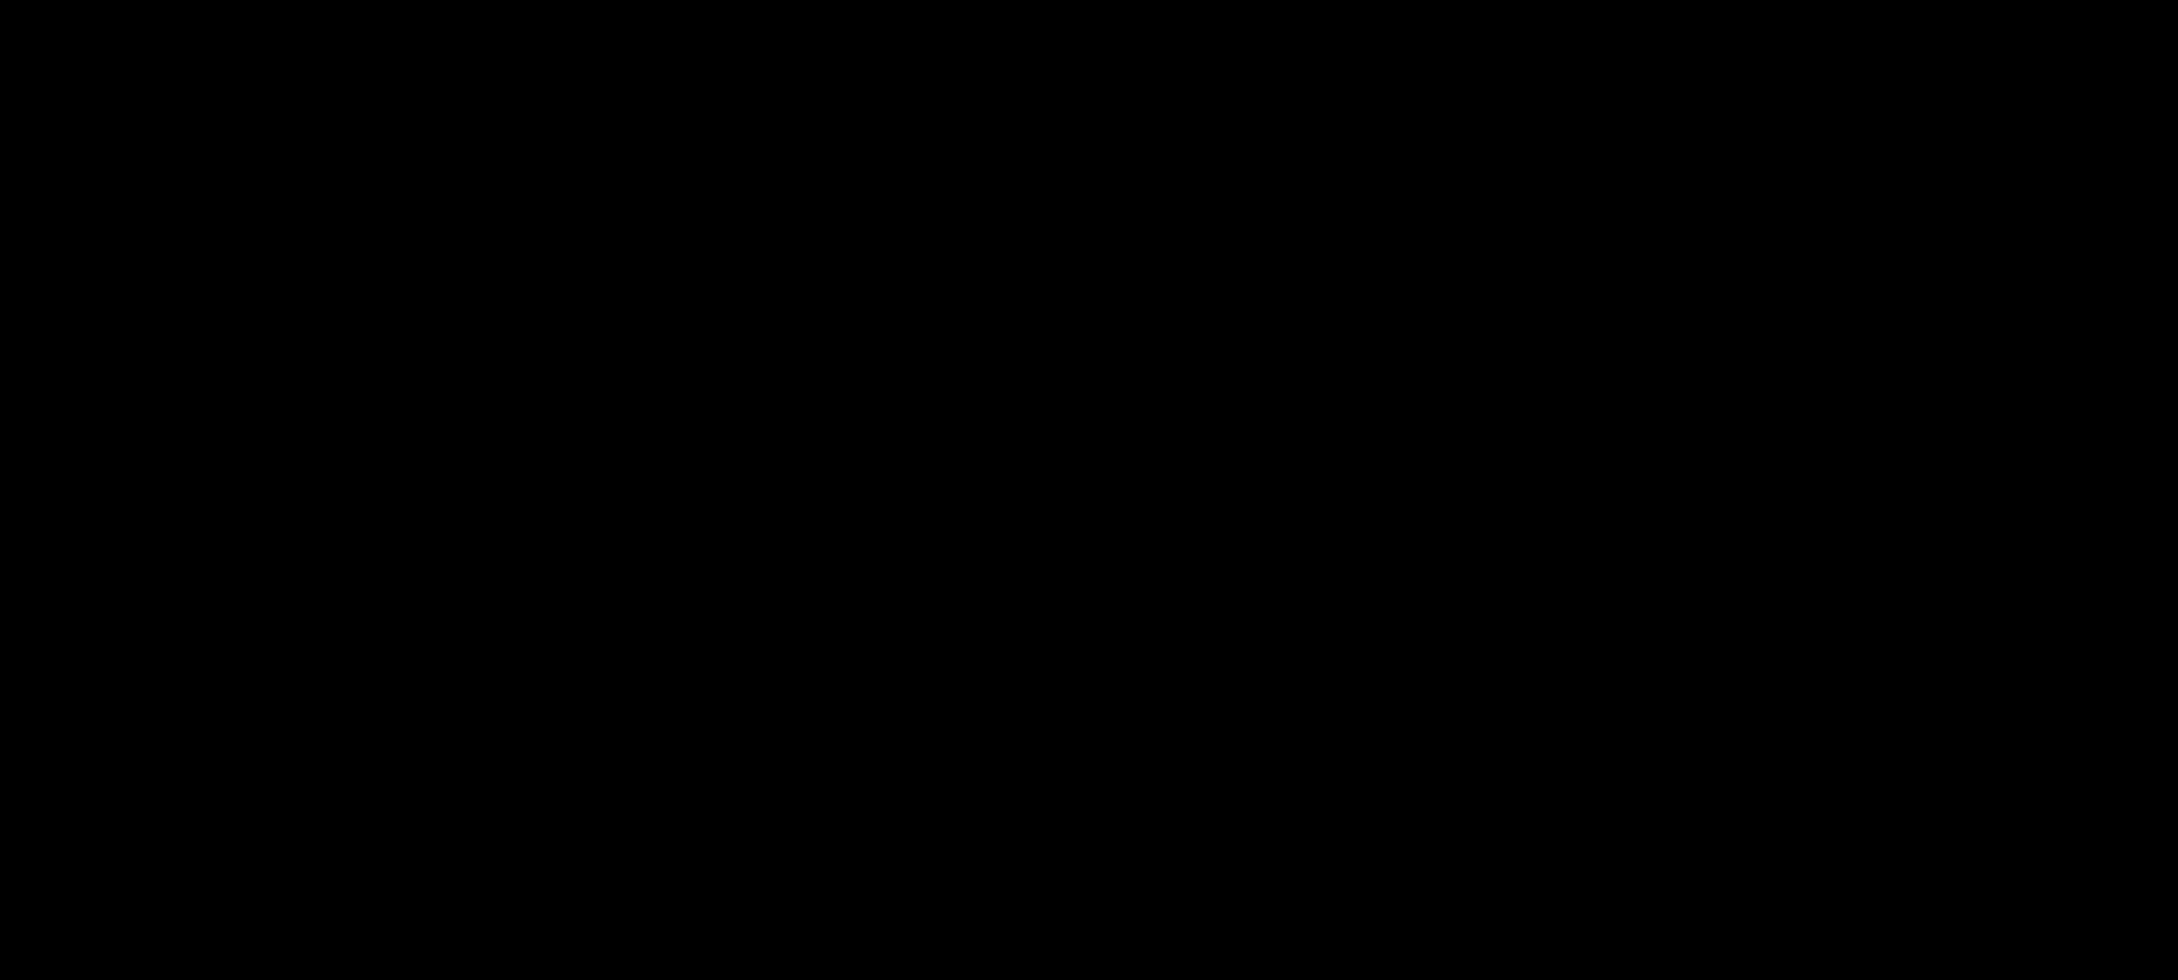 Adler-Logo png